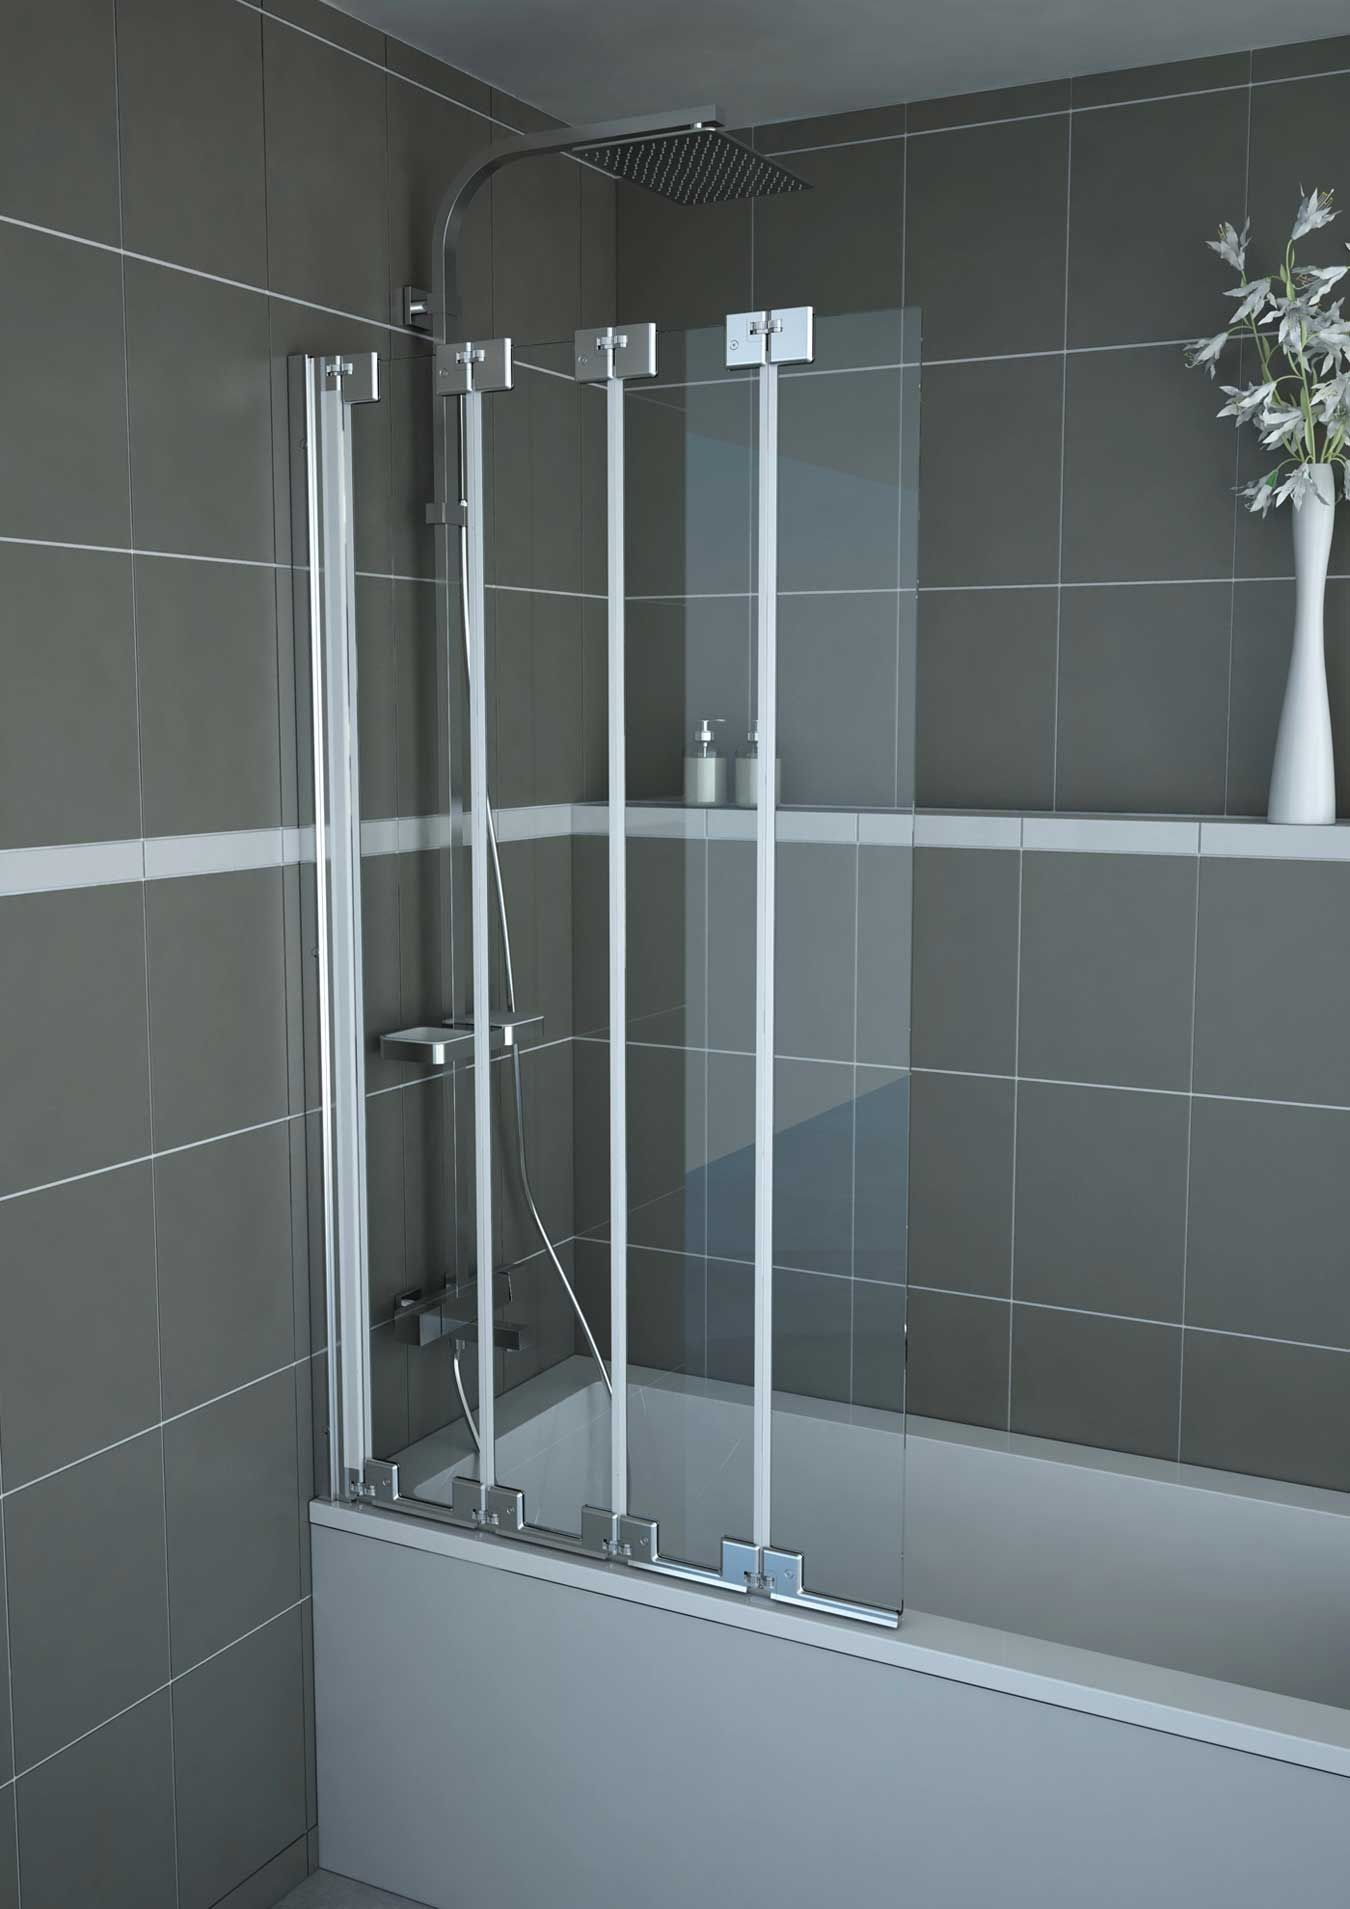 Folding Shower Doors For Tubs Bathtub Shower Doors Tub Doors